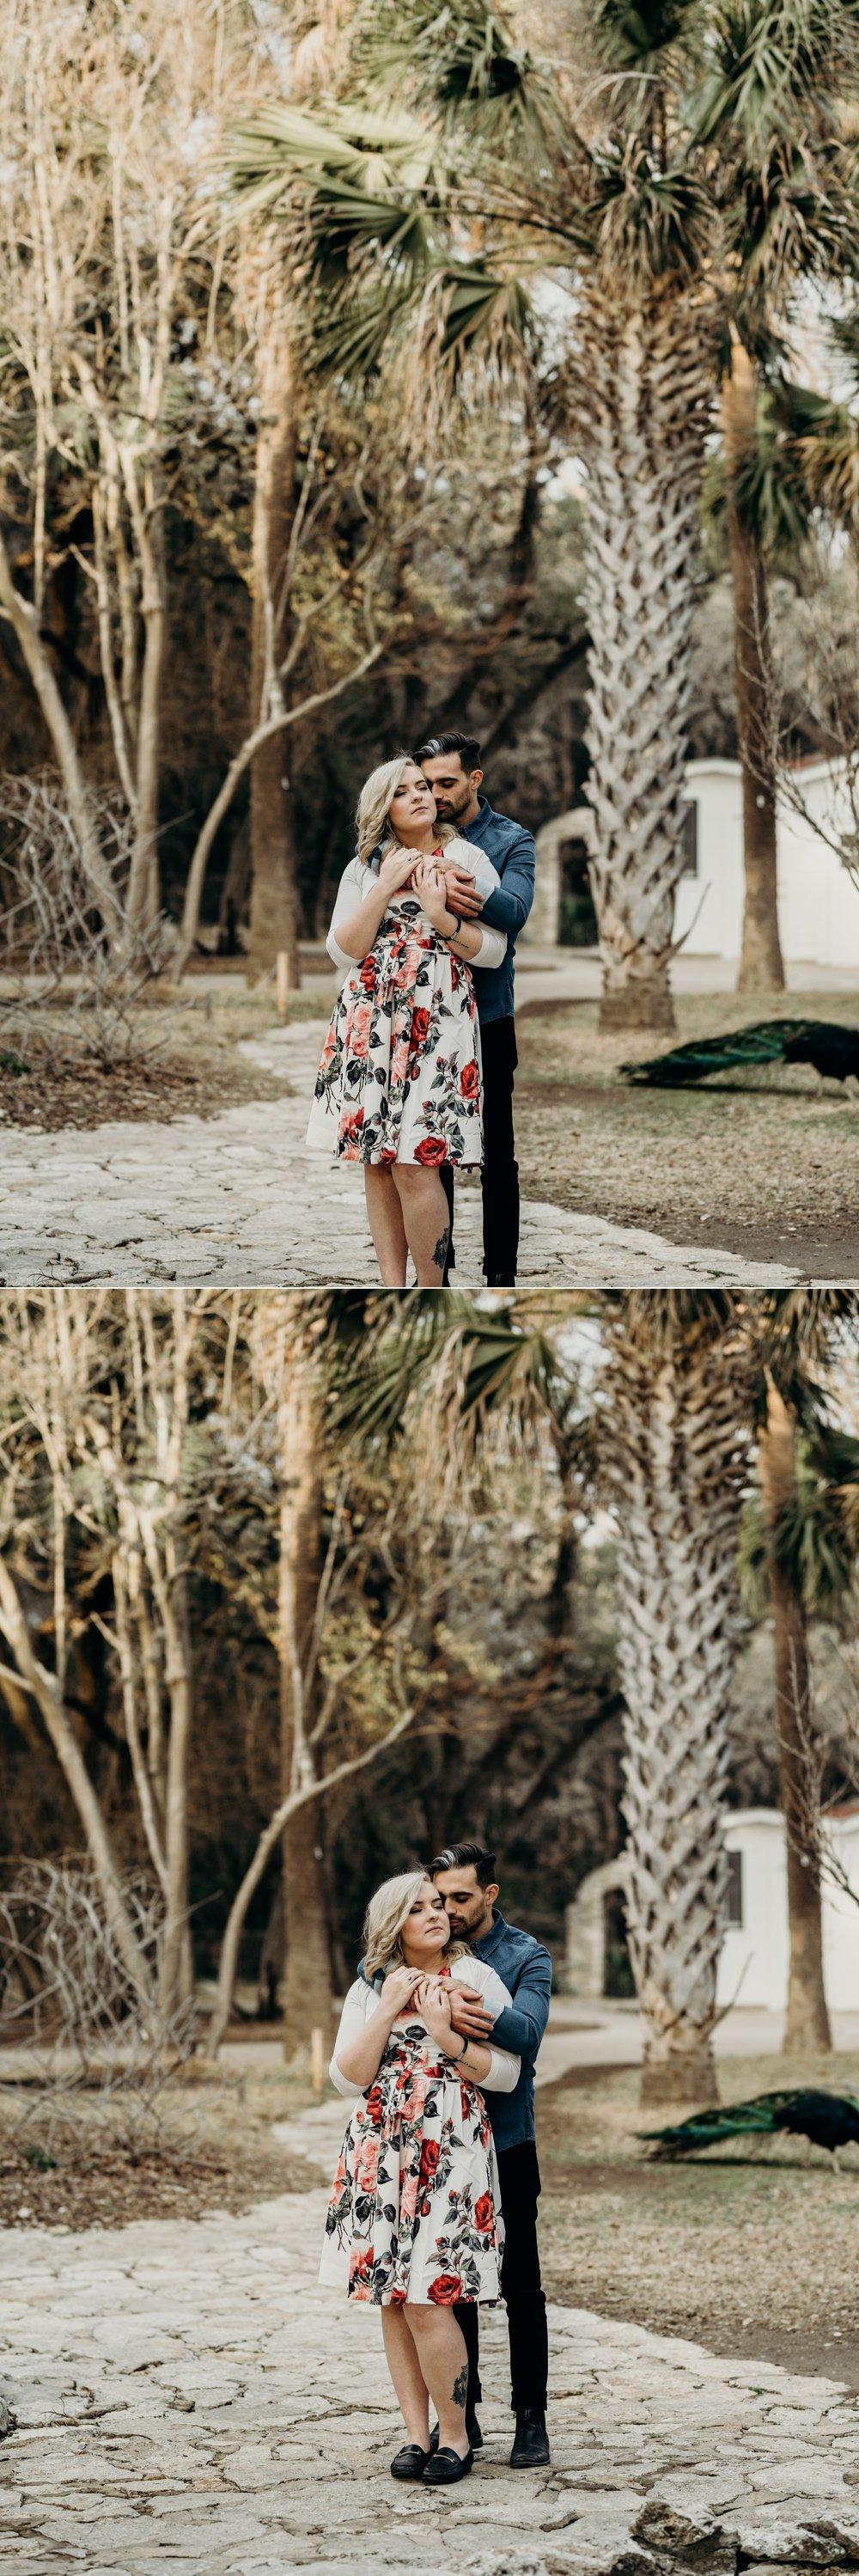 drew-andrew-texas-austin-minnesota-minneapolis-wedding-photographer-destination-elopement-intimate-adventurous_0099.jpg